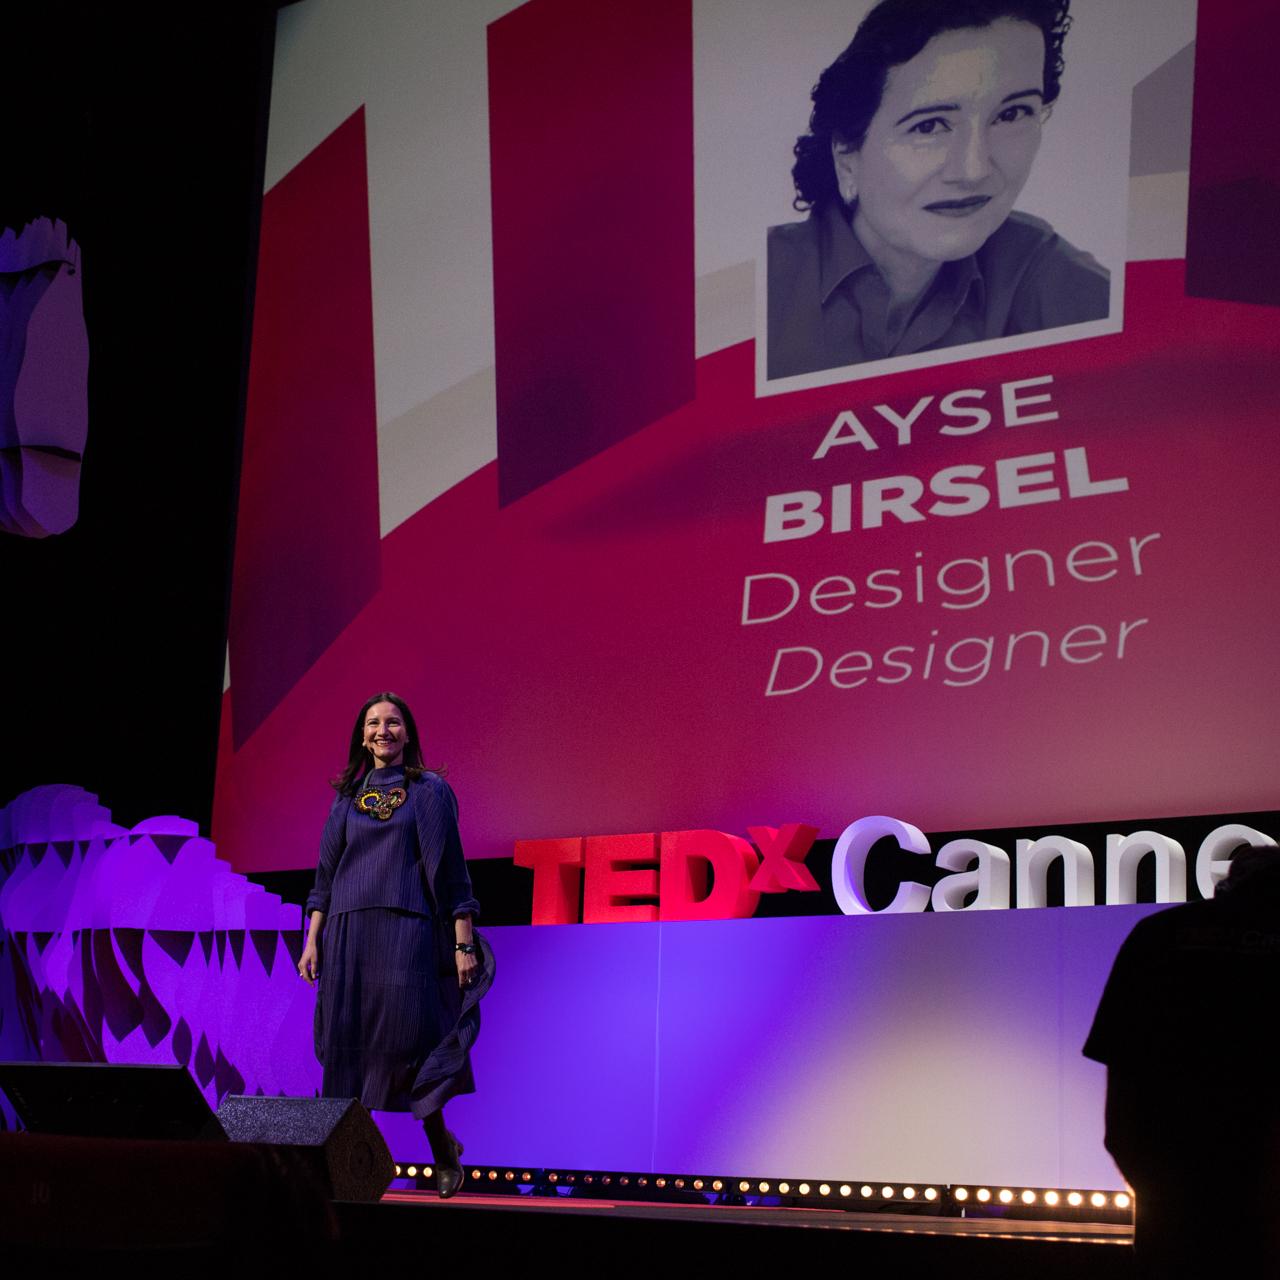 (c)Priscilla Stanley_TEDx Cannes 2017-15